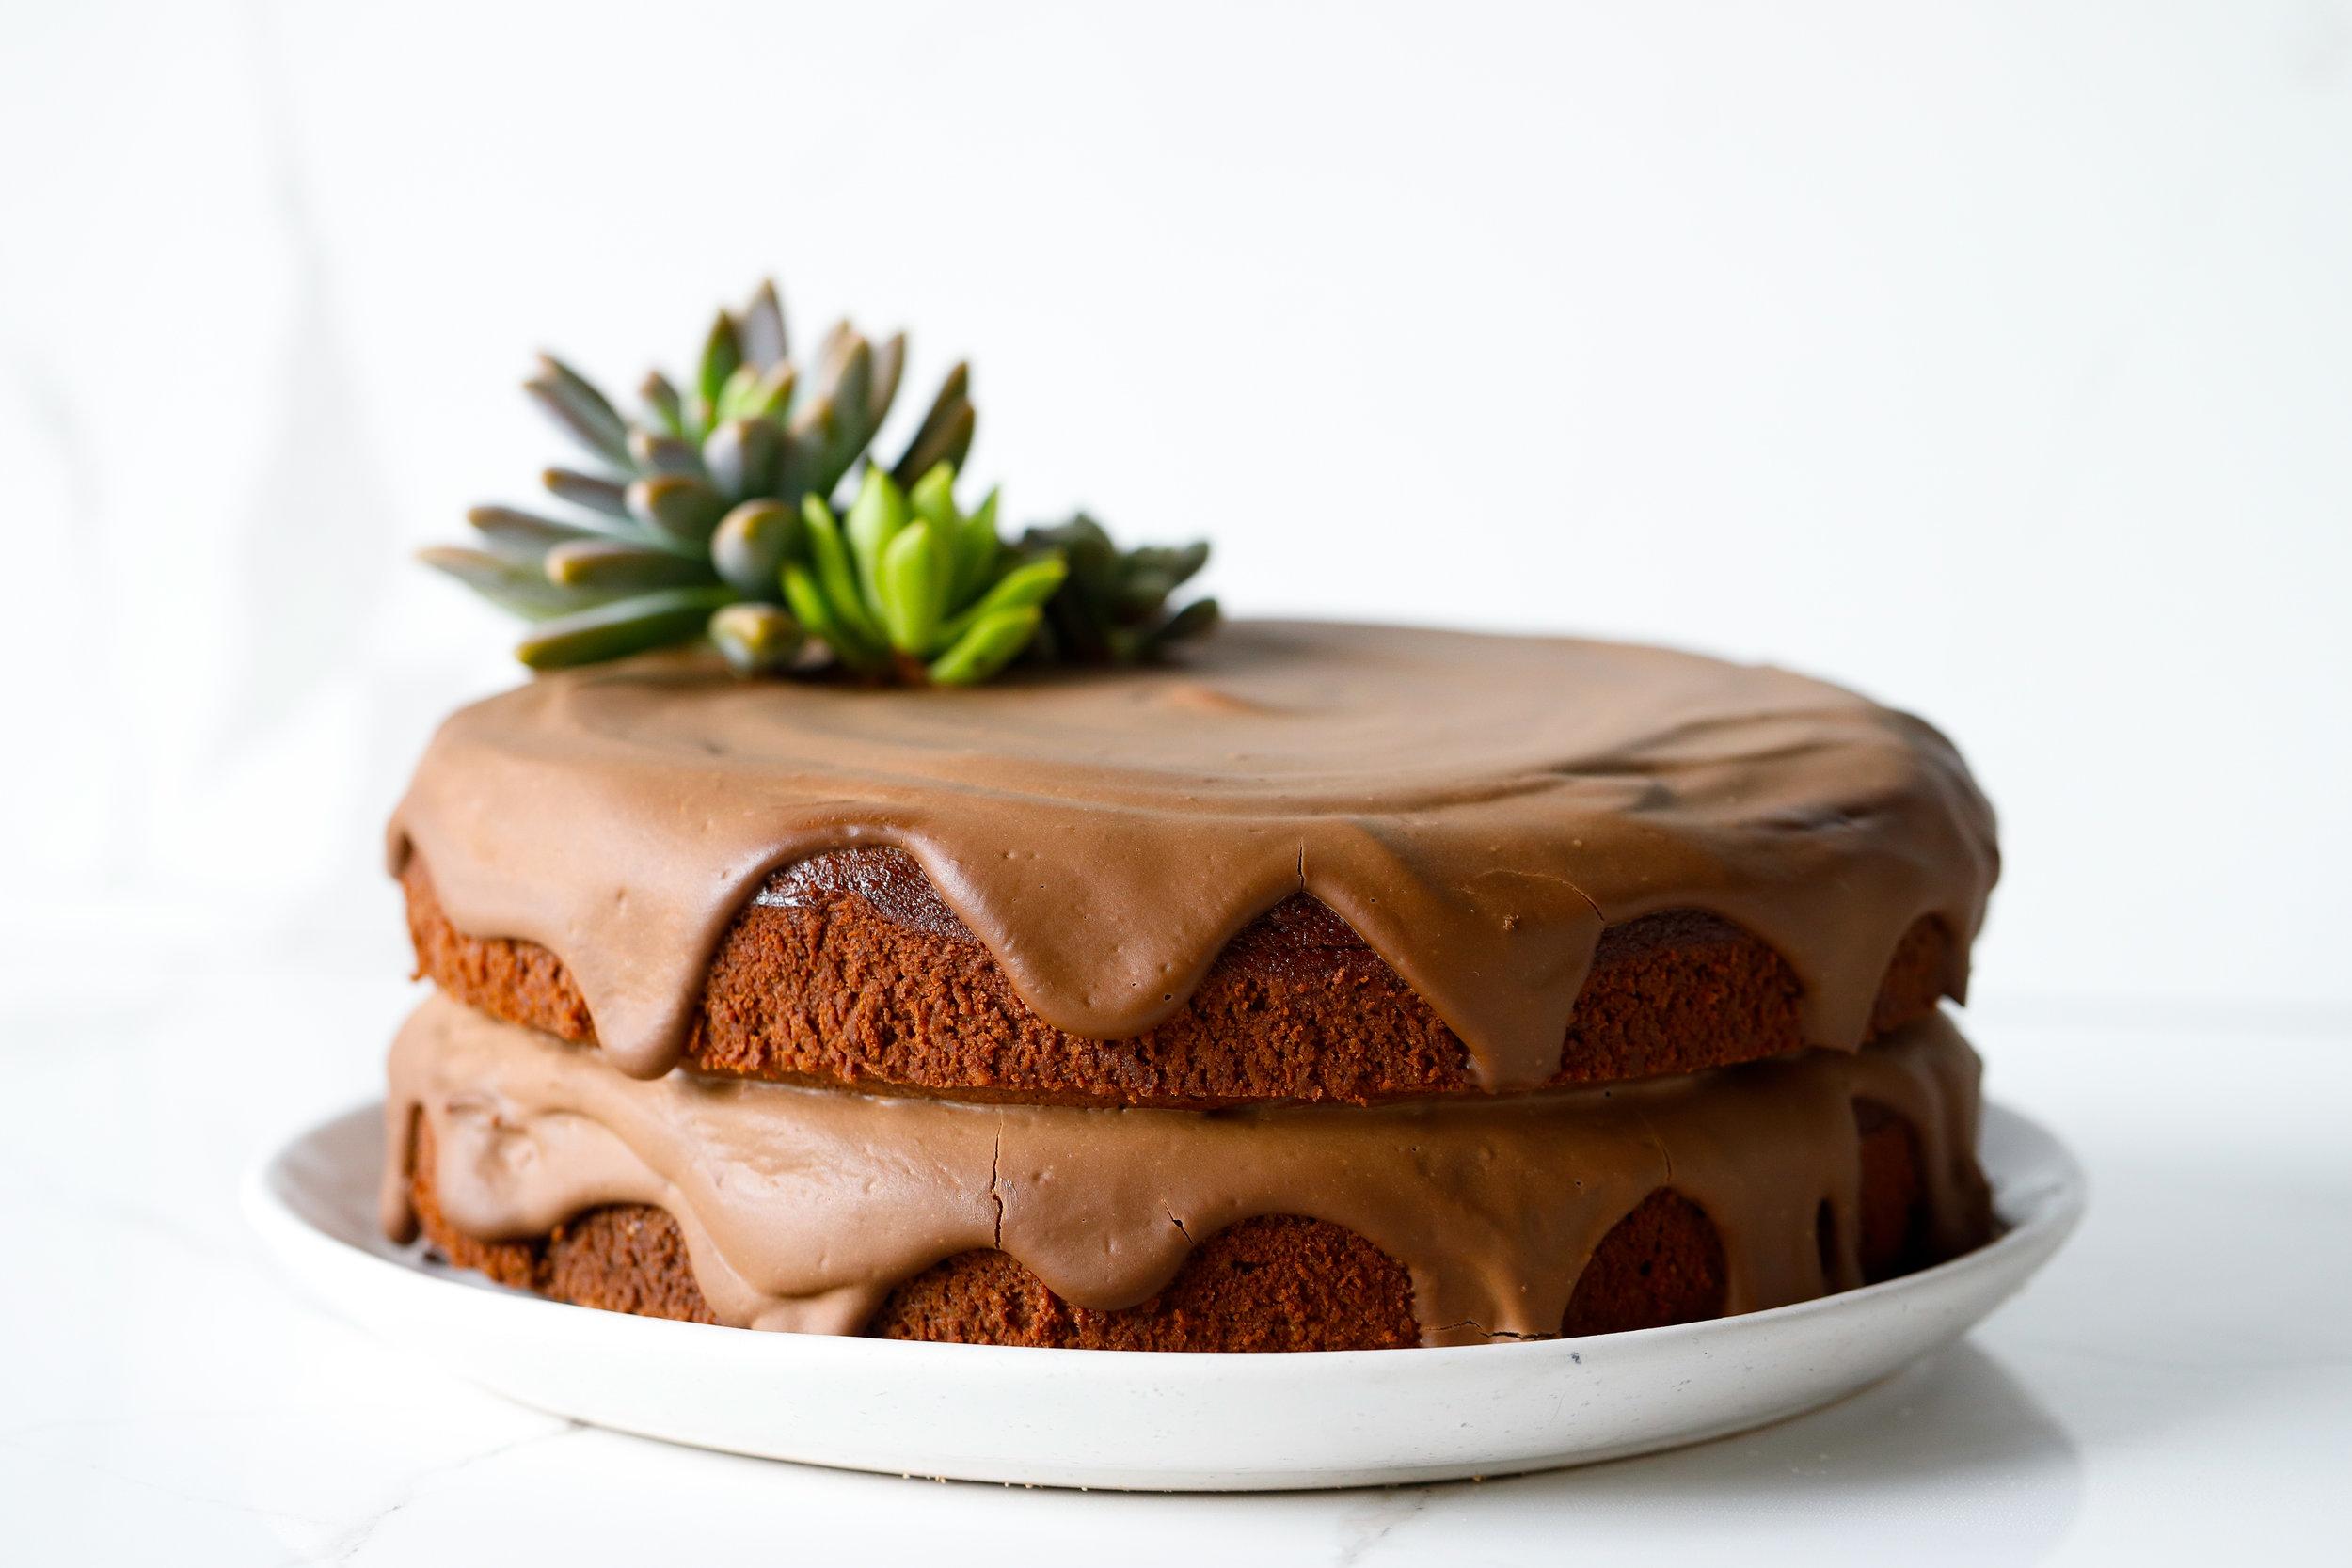 Incredibly_Decadent_Chocolate_Cake_1.jpg